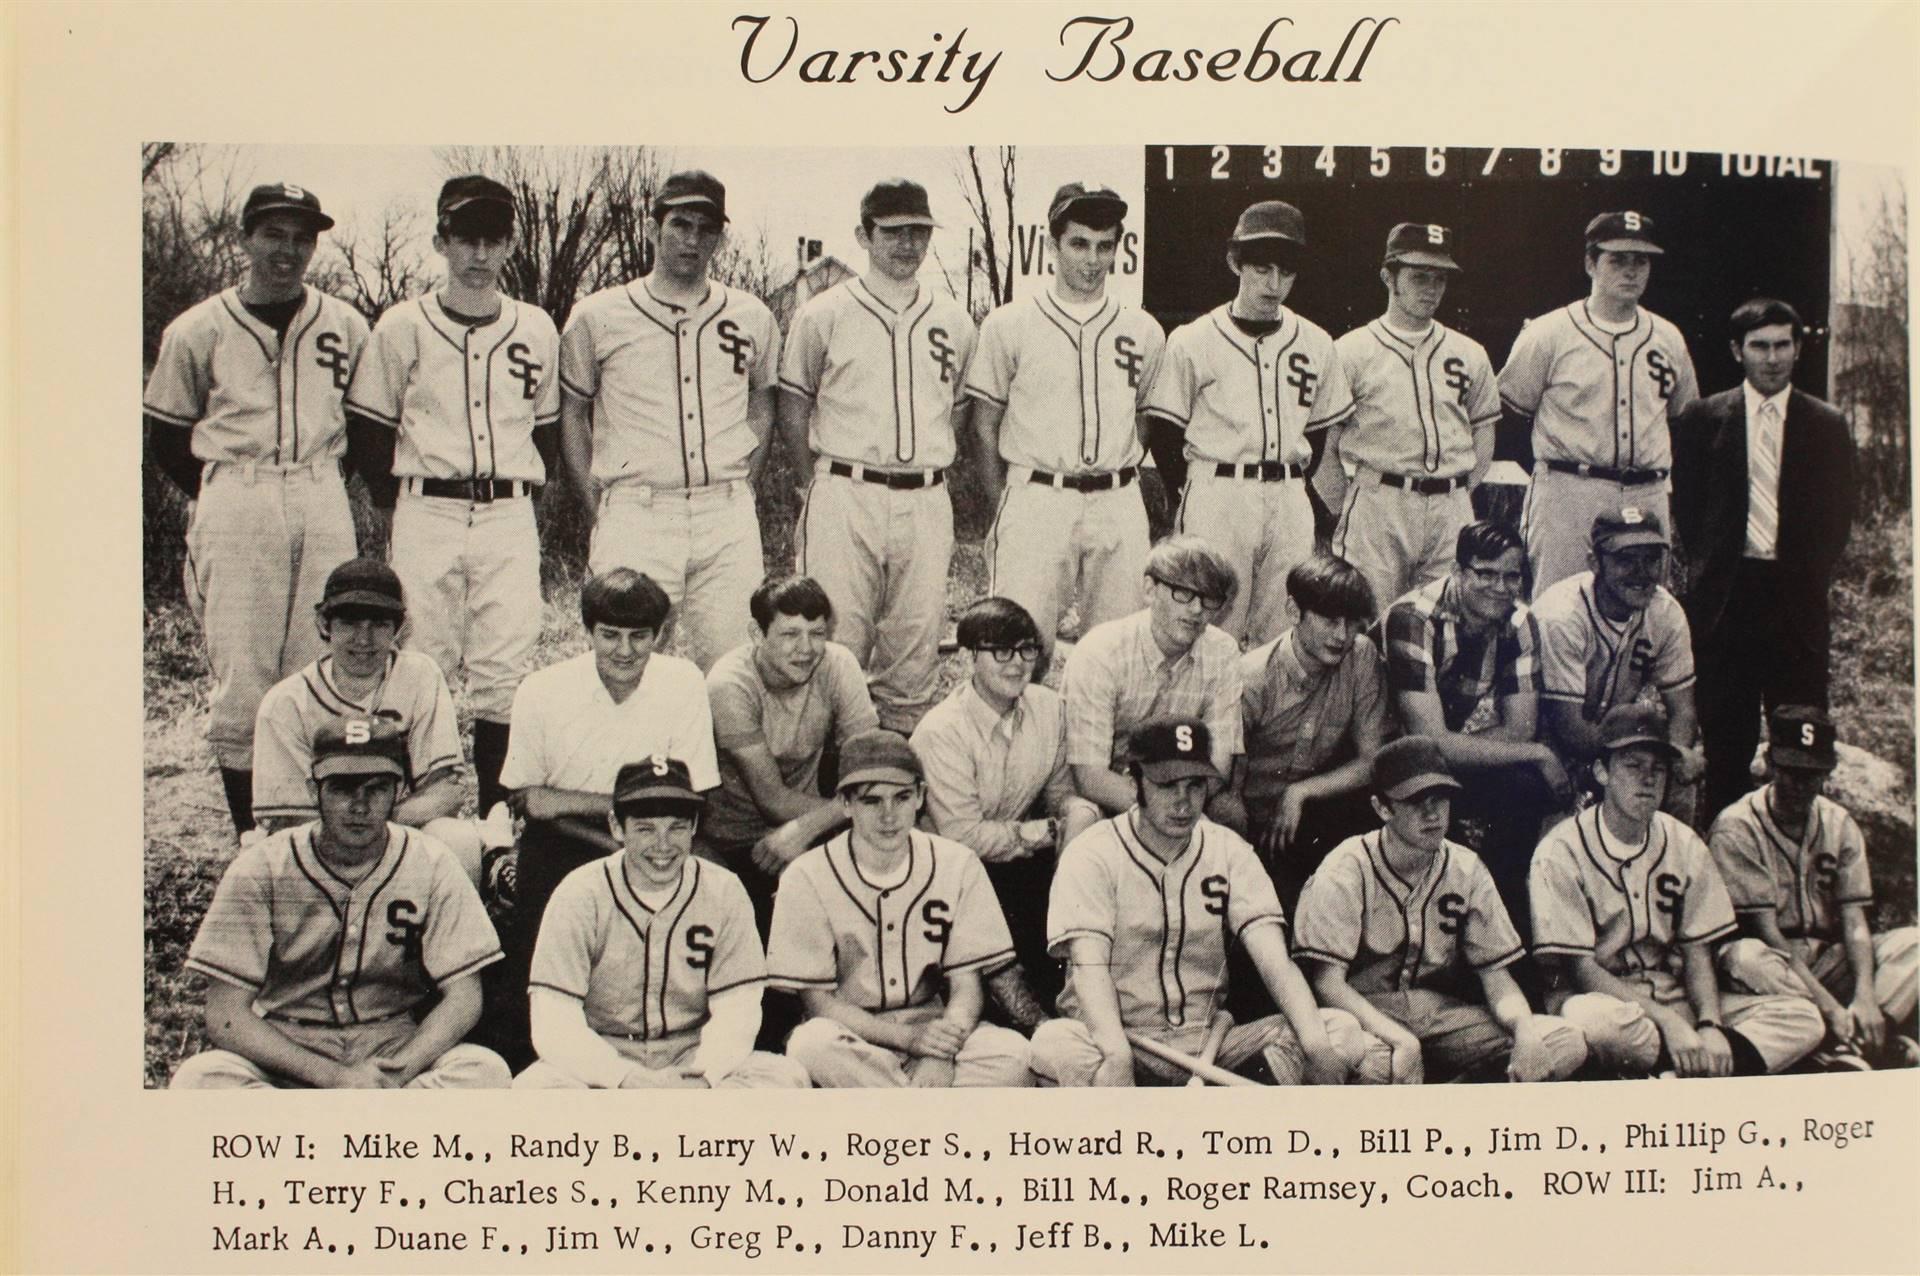 1970 Varsity Baseball